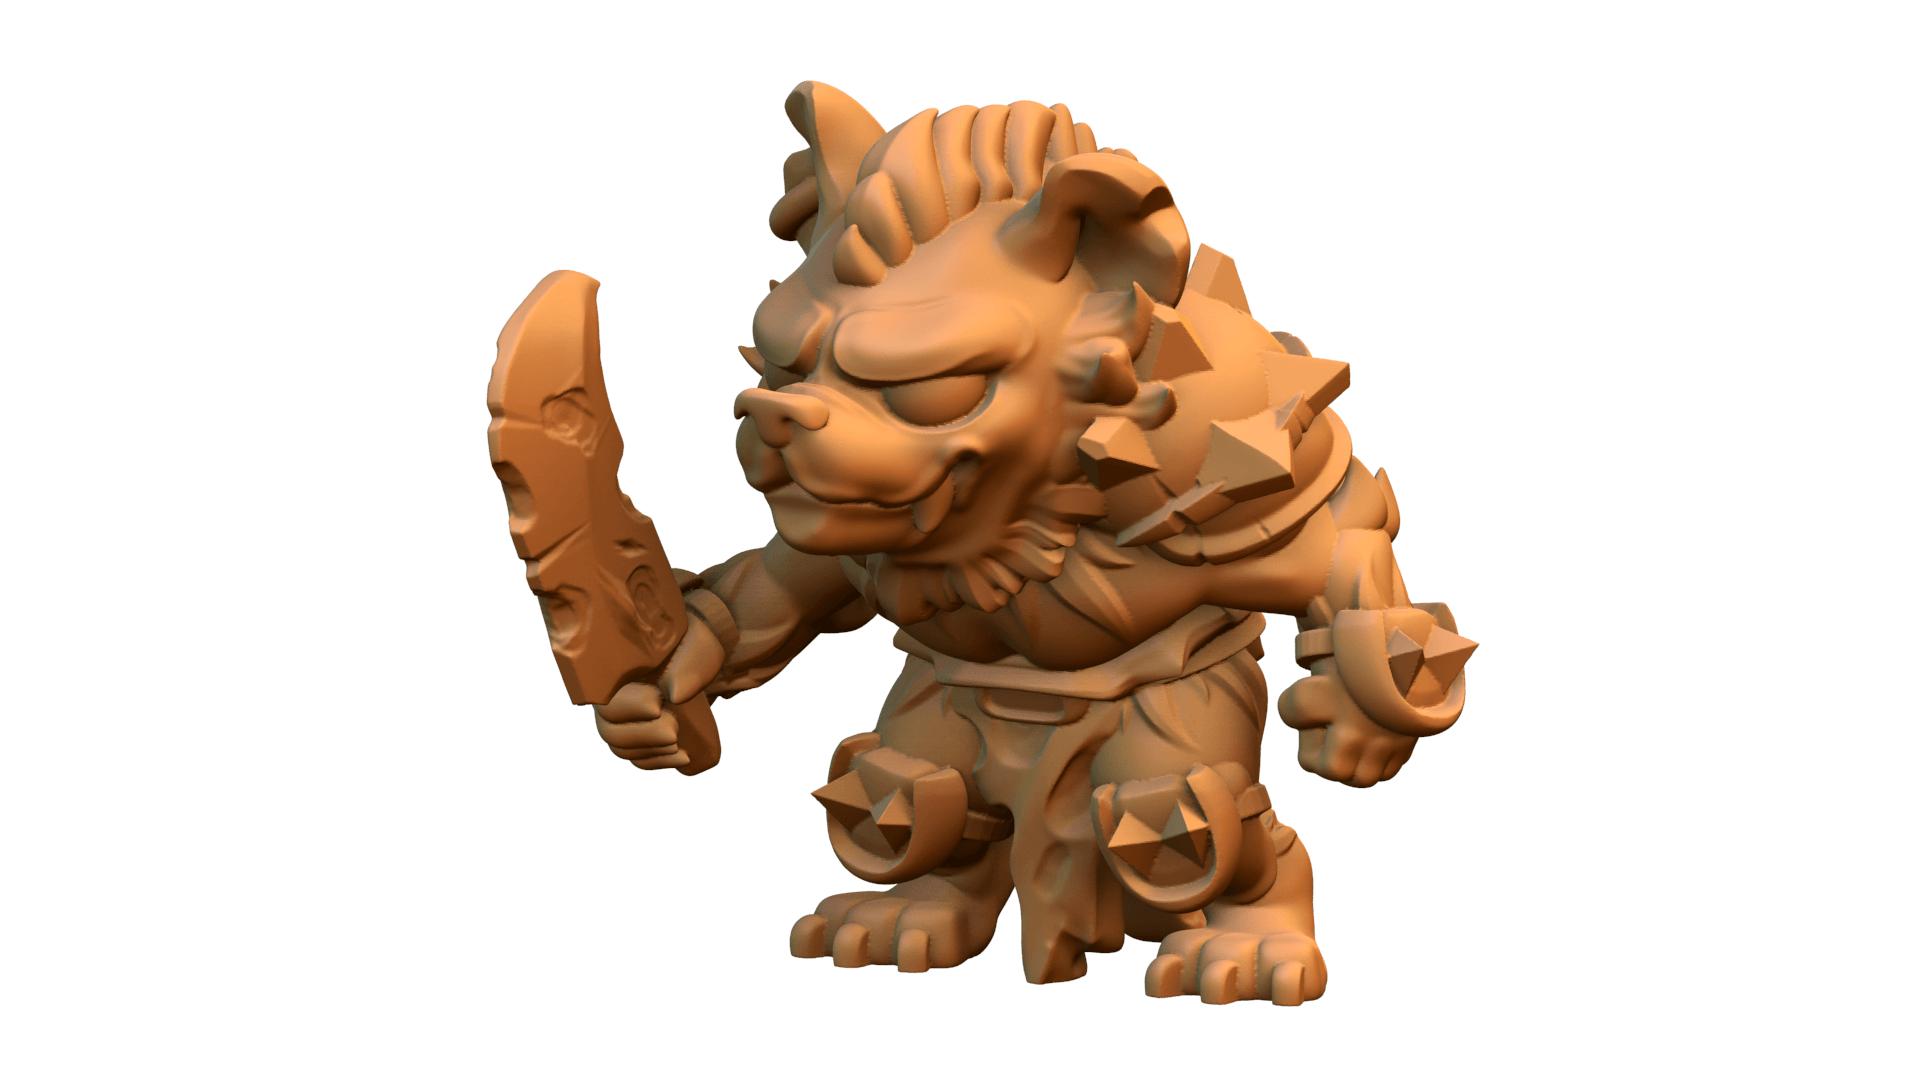 untitled.596.png Download free STL file Gnoll • 3D printable design, HeribertoValle